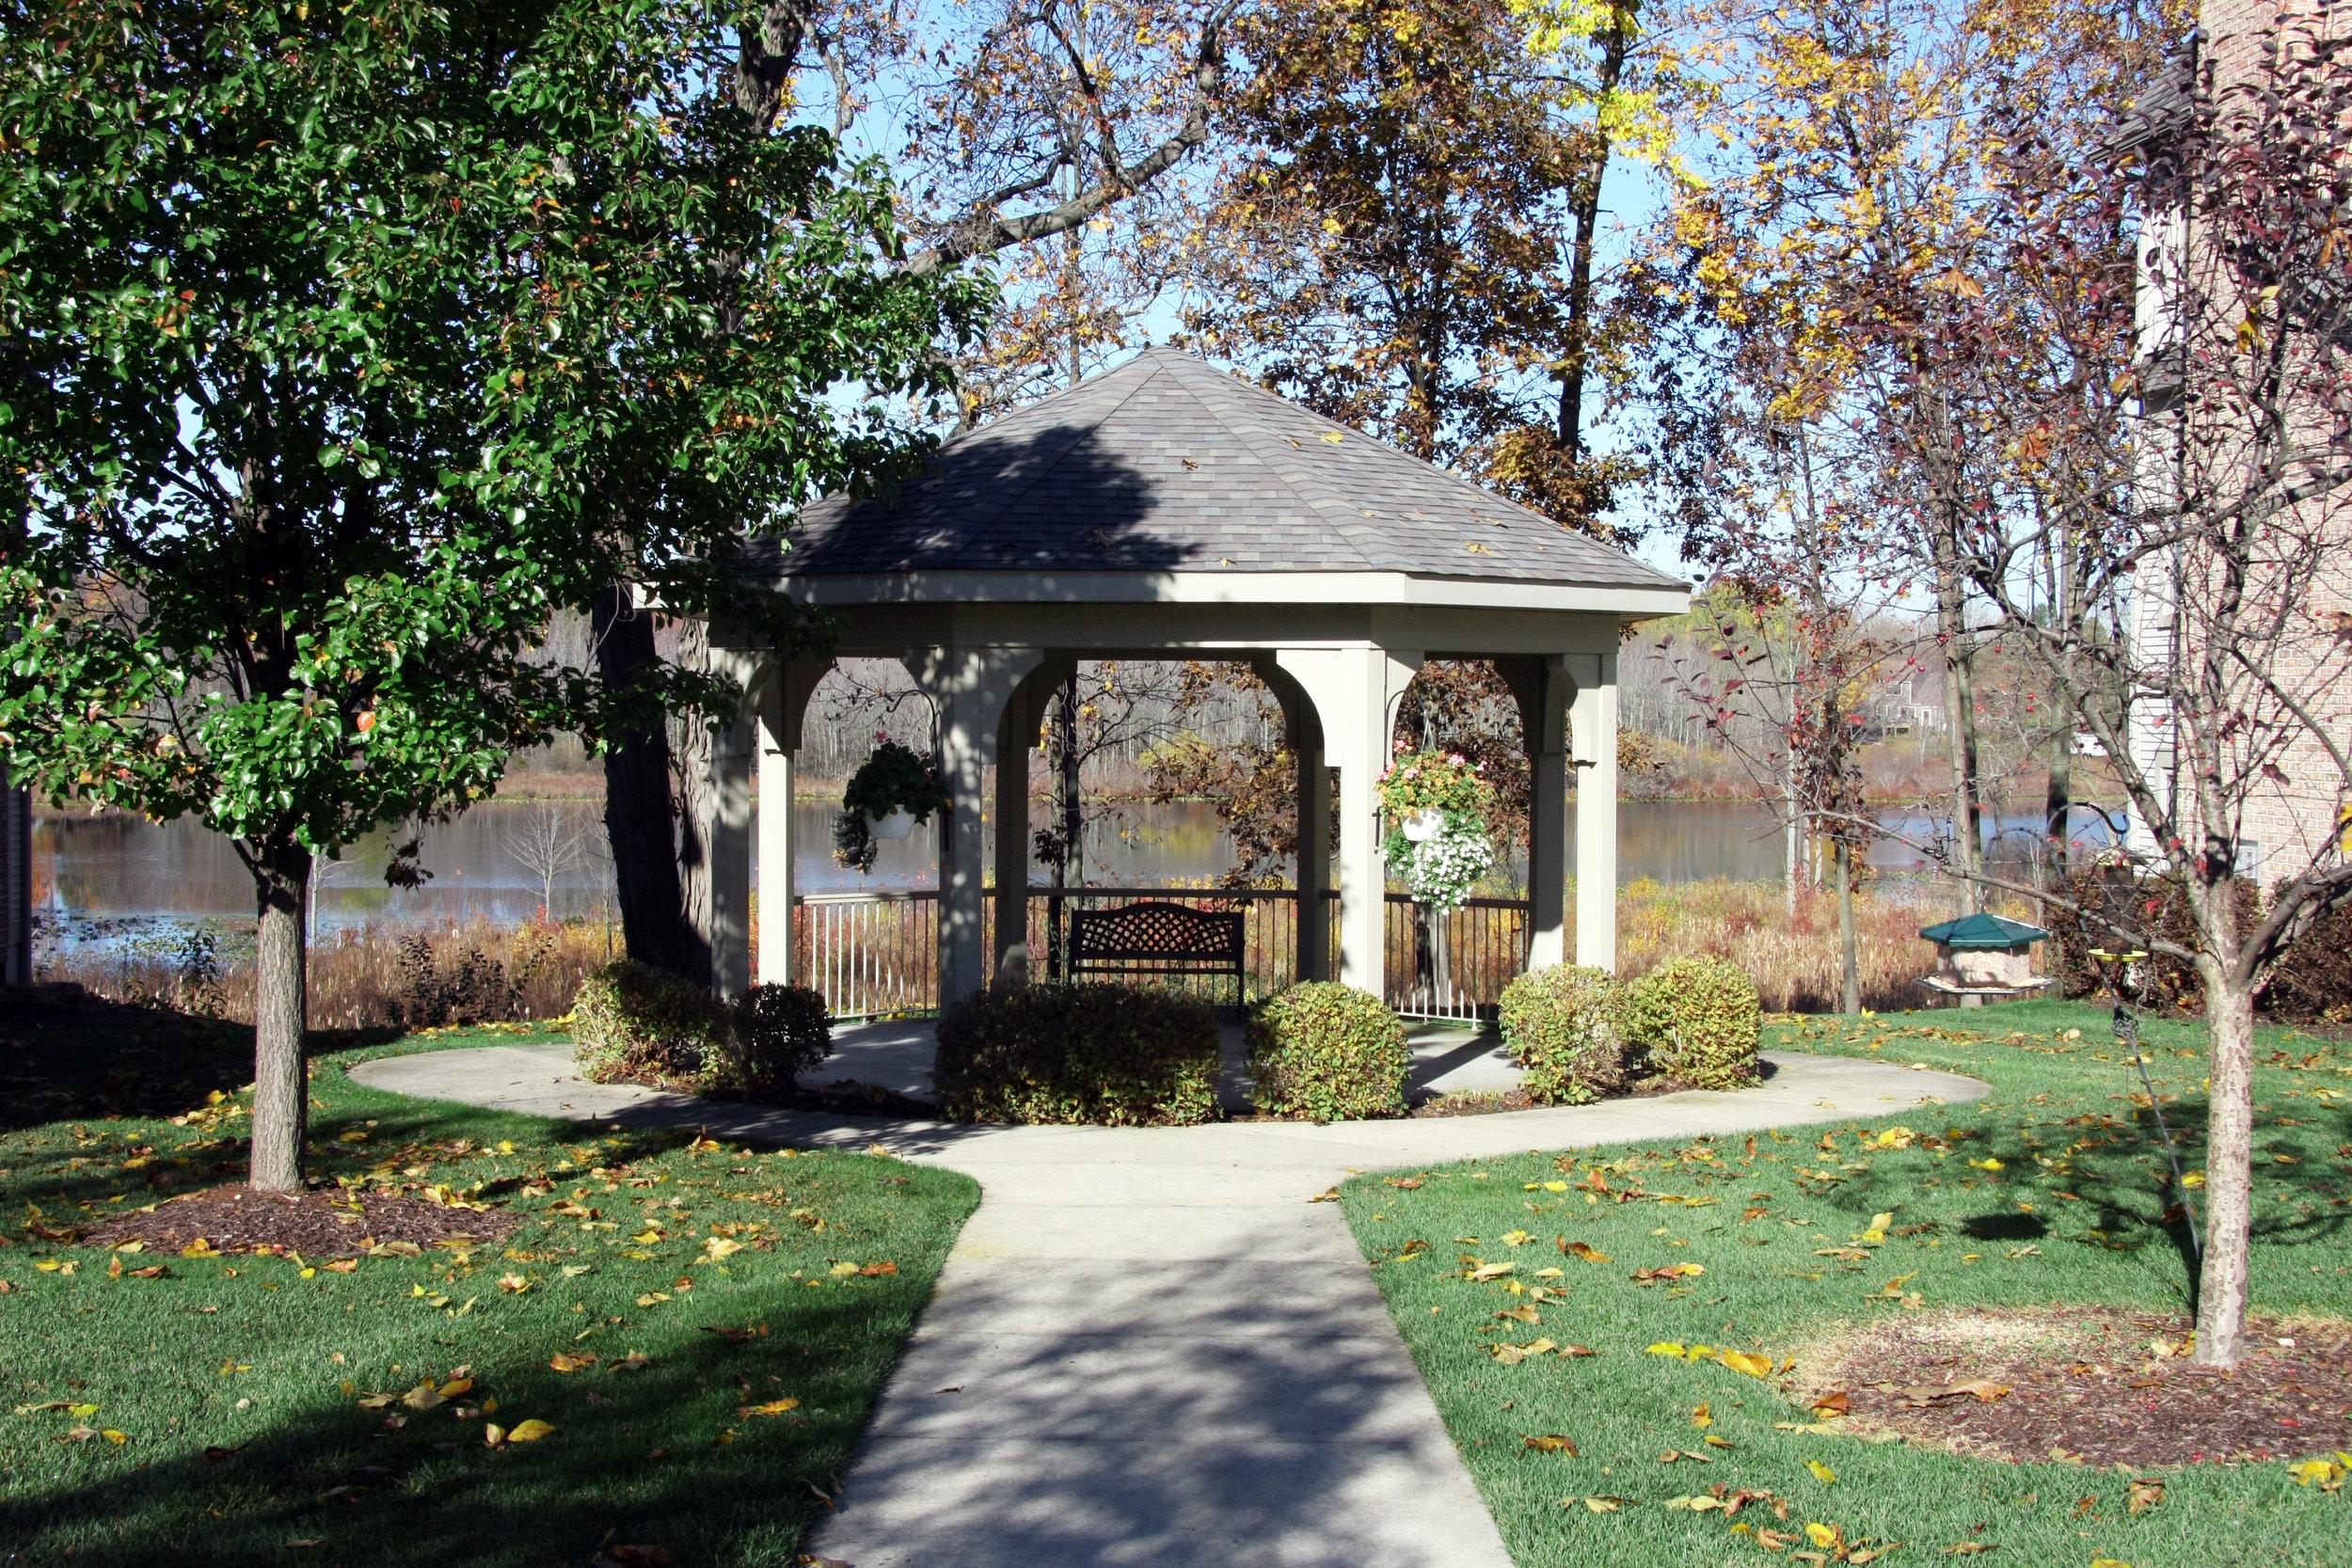 15 Peartree Lane NE, Grand Rapids - Gorgeous custom home with breathtaking views